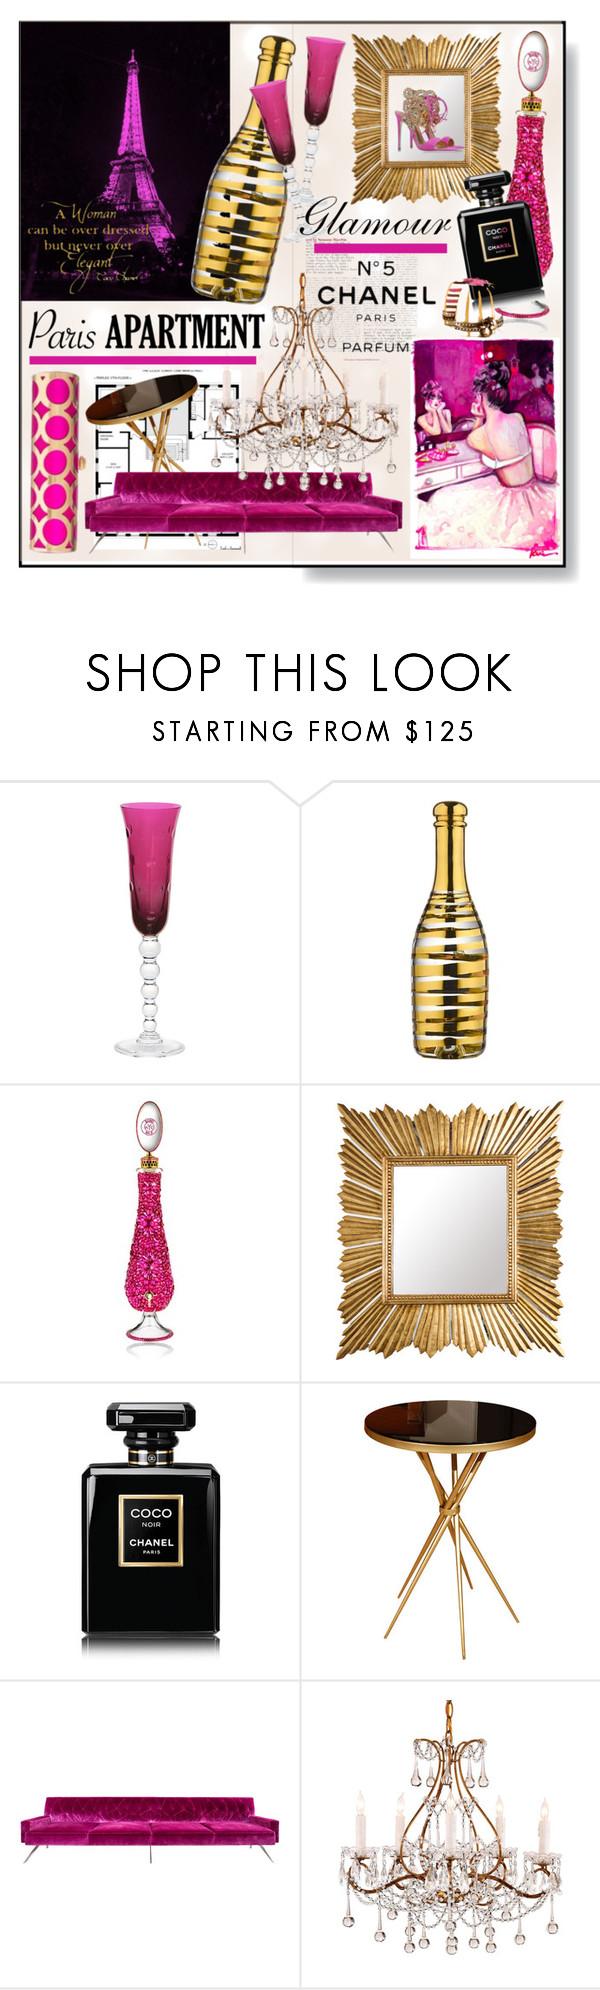 """Paris Apartment * Pink & Purple Living Room"" by calamity-jane-always ❤ liked on Polyvore featuring interior, interiors, interior design, home, home decor, interior decorating, Saint Louis, Kosta Boda, Bond No. 9 and Amanda Pearl"